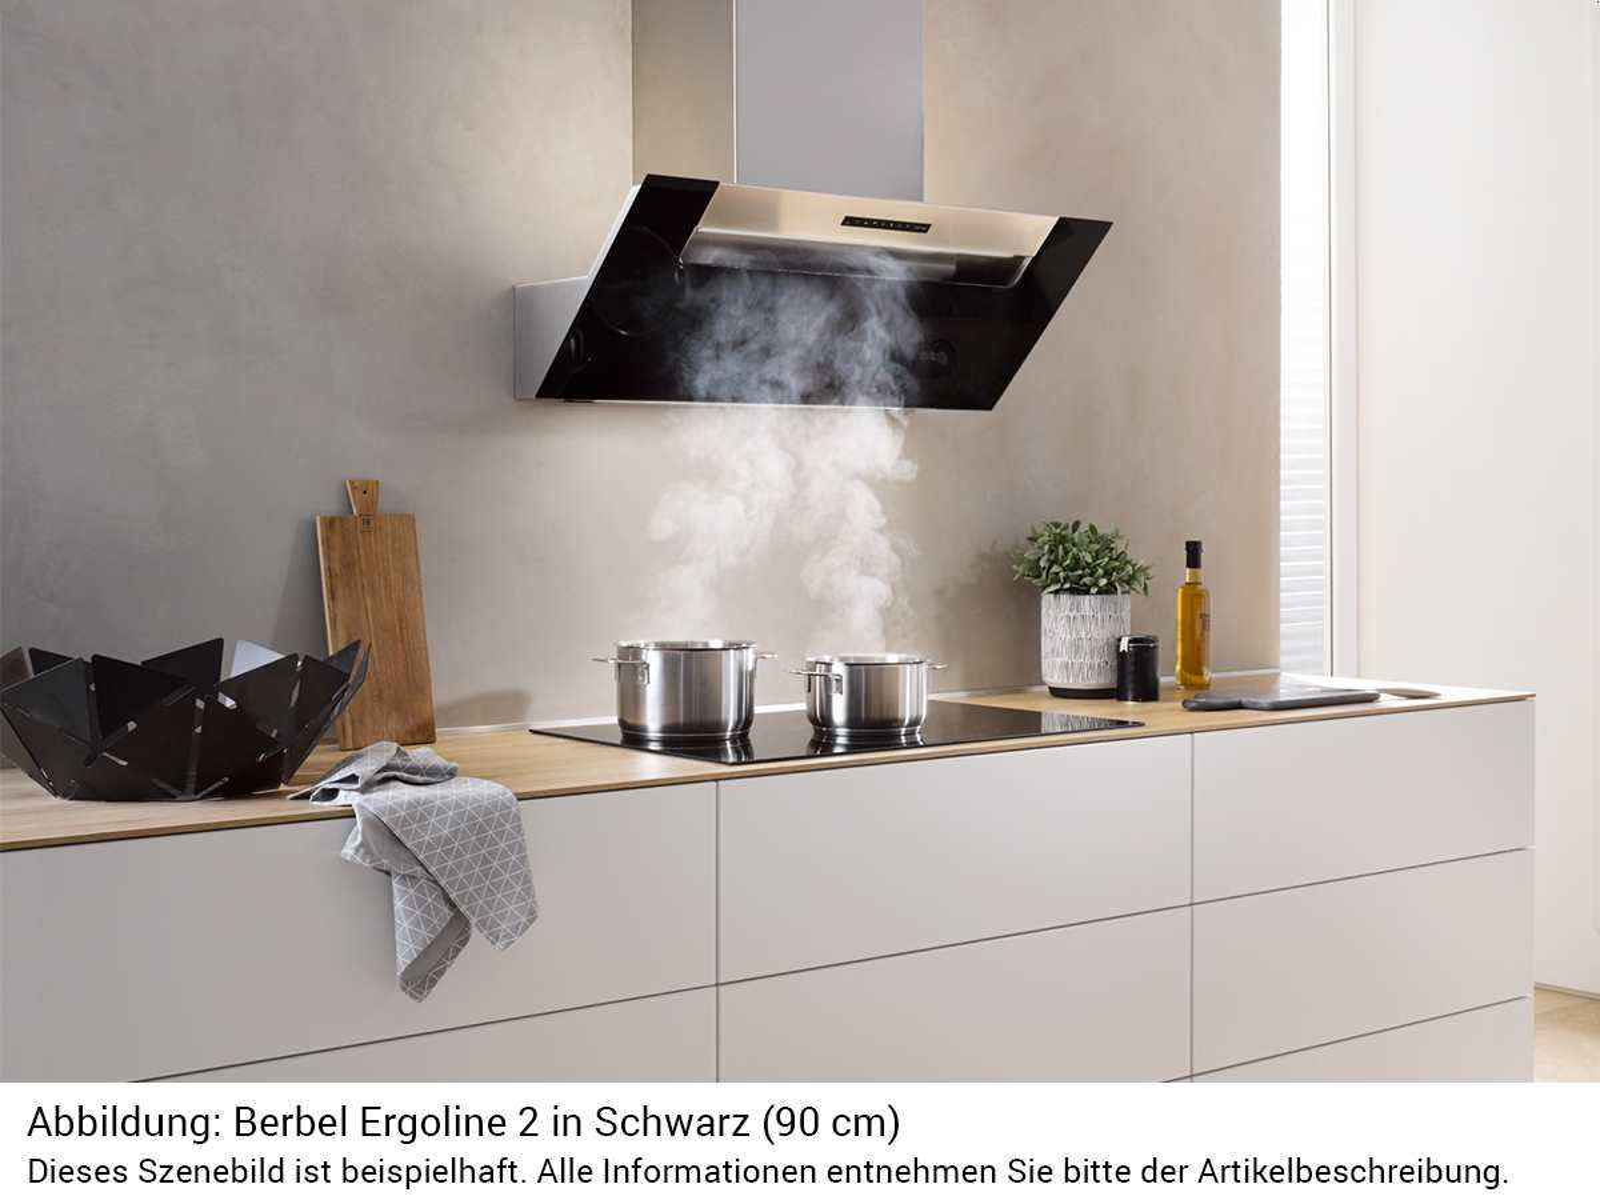 berbel ergoline 2 bkh 60 eg 2 kopffreihaube schwarz. Black Bedroom Furniture Sets. Home Design Ideas